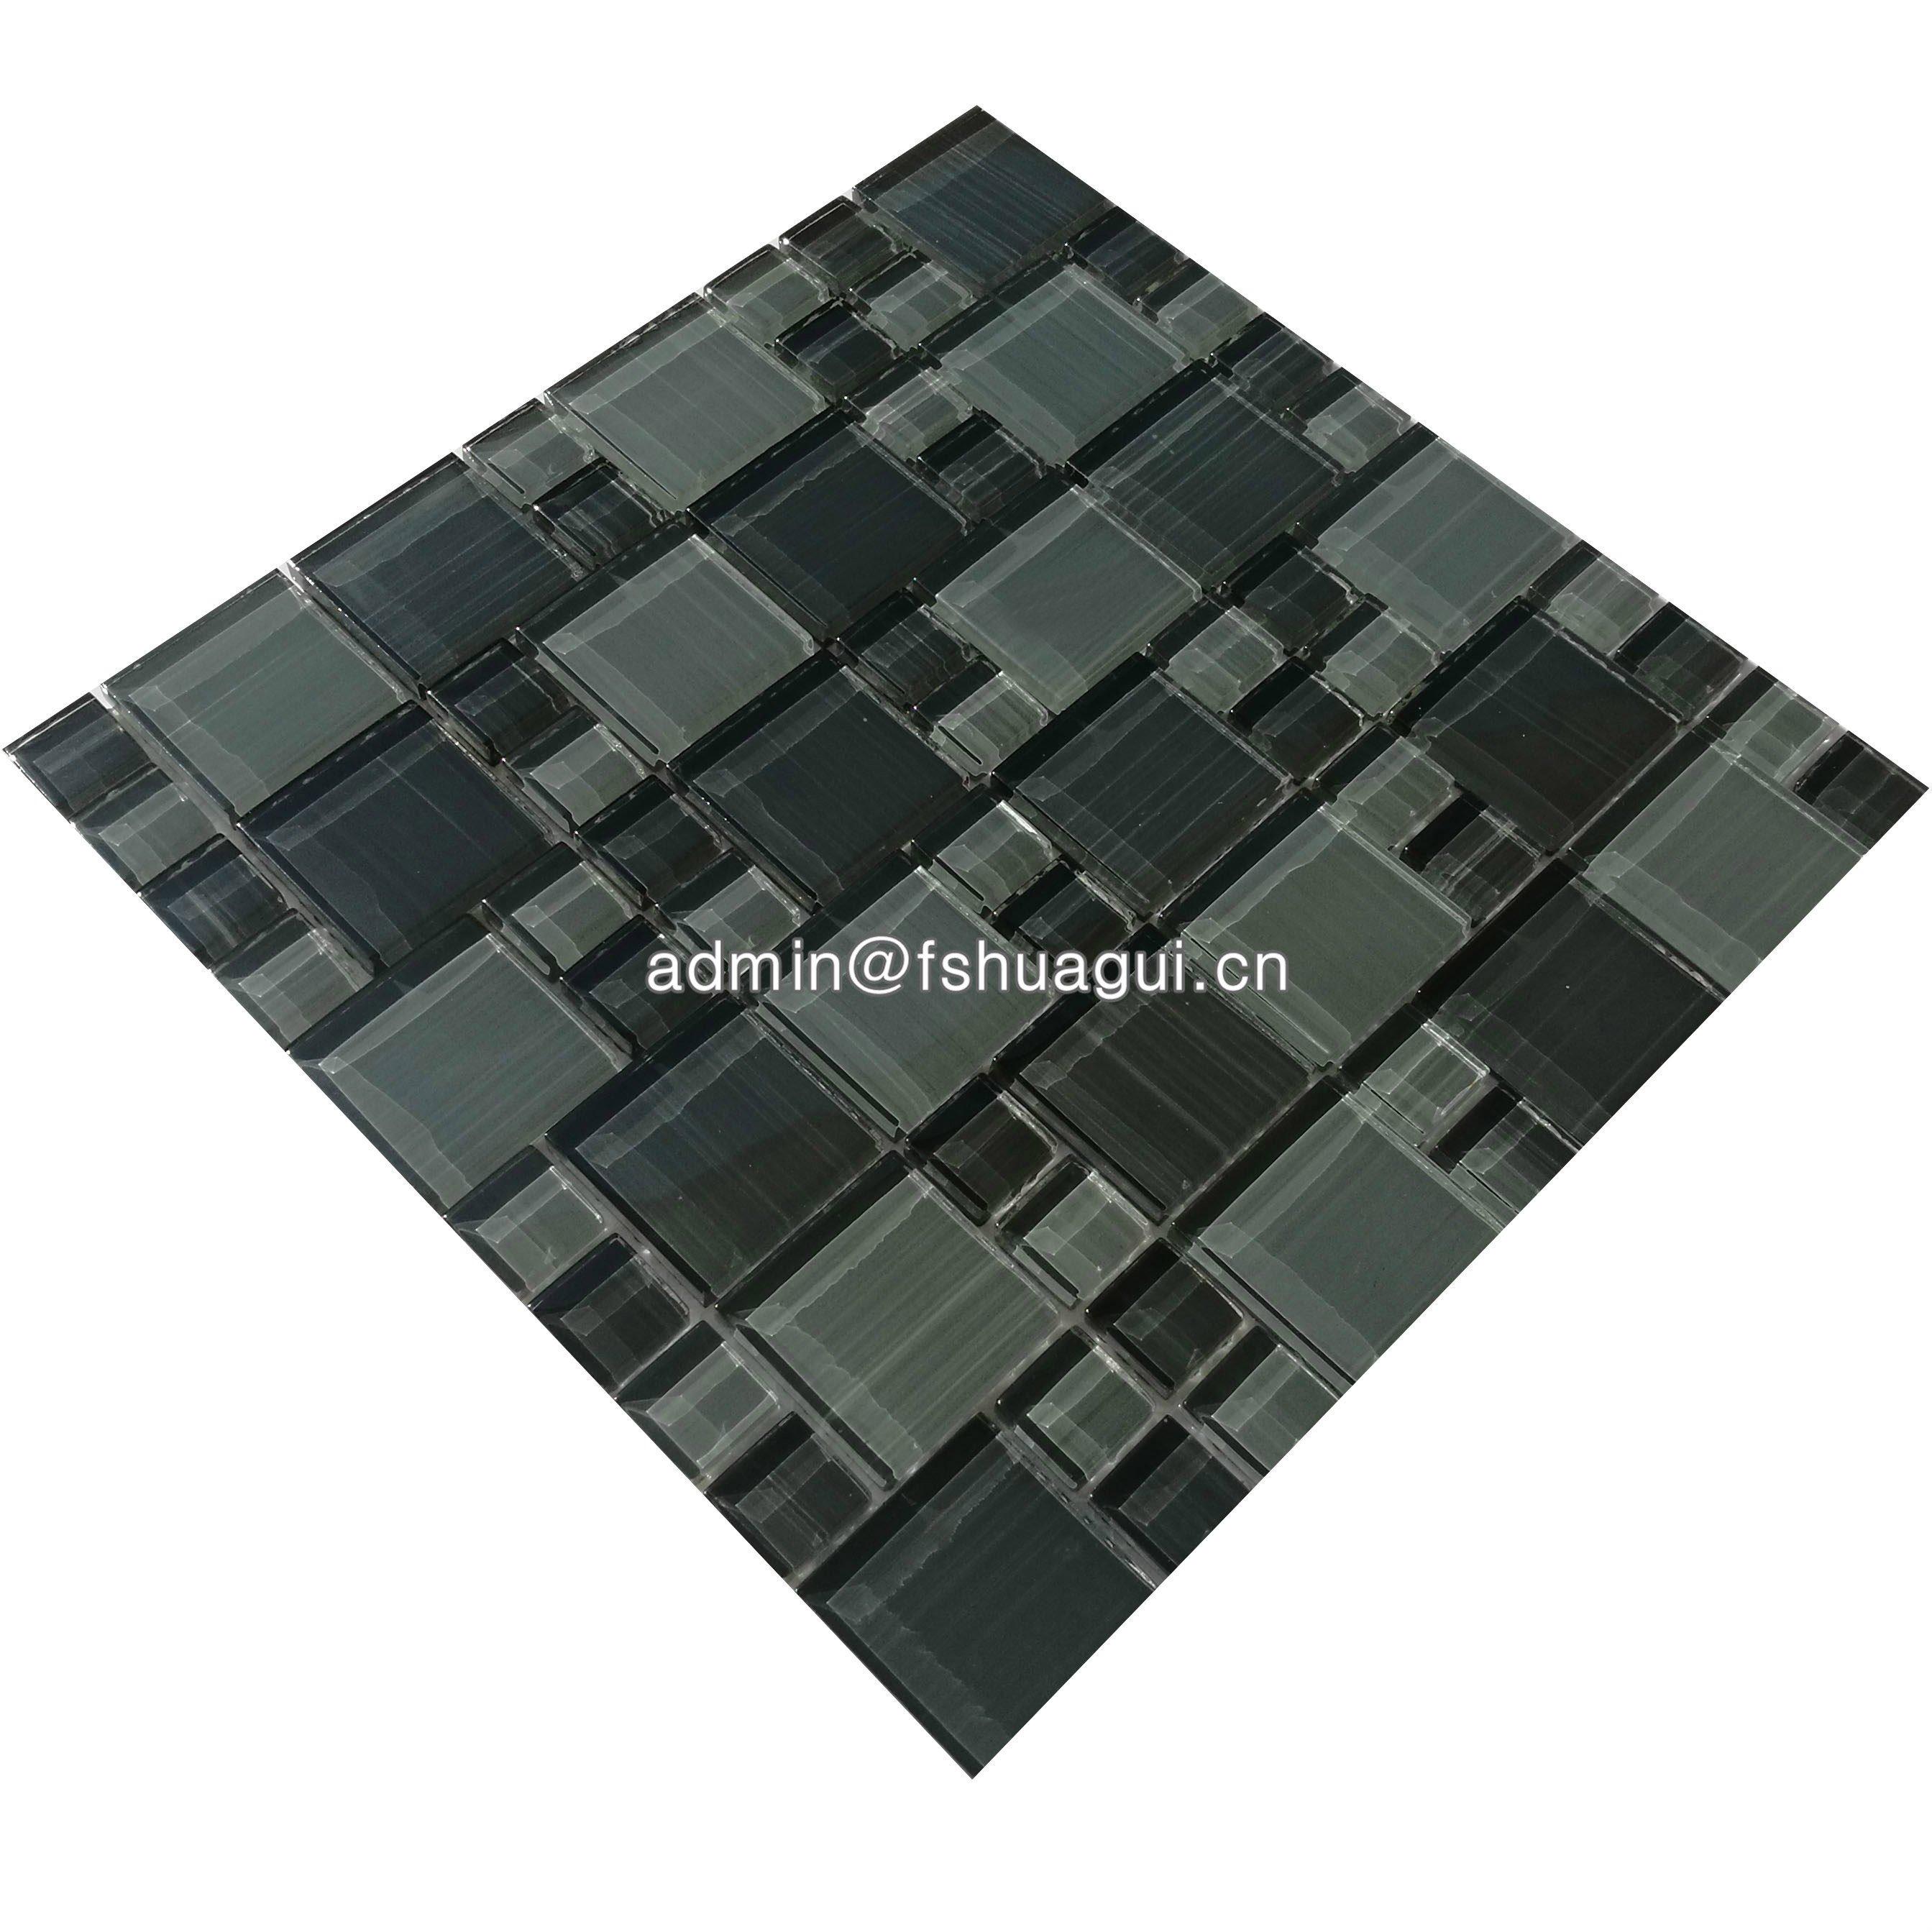 Huagui Glass mosaic HG-ES002 GLASS MOSAIC TILE image69